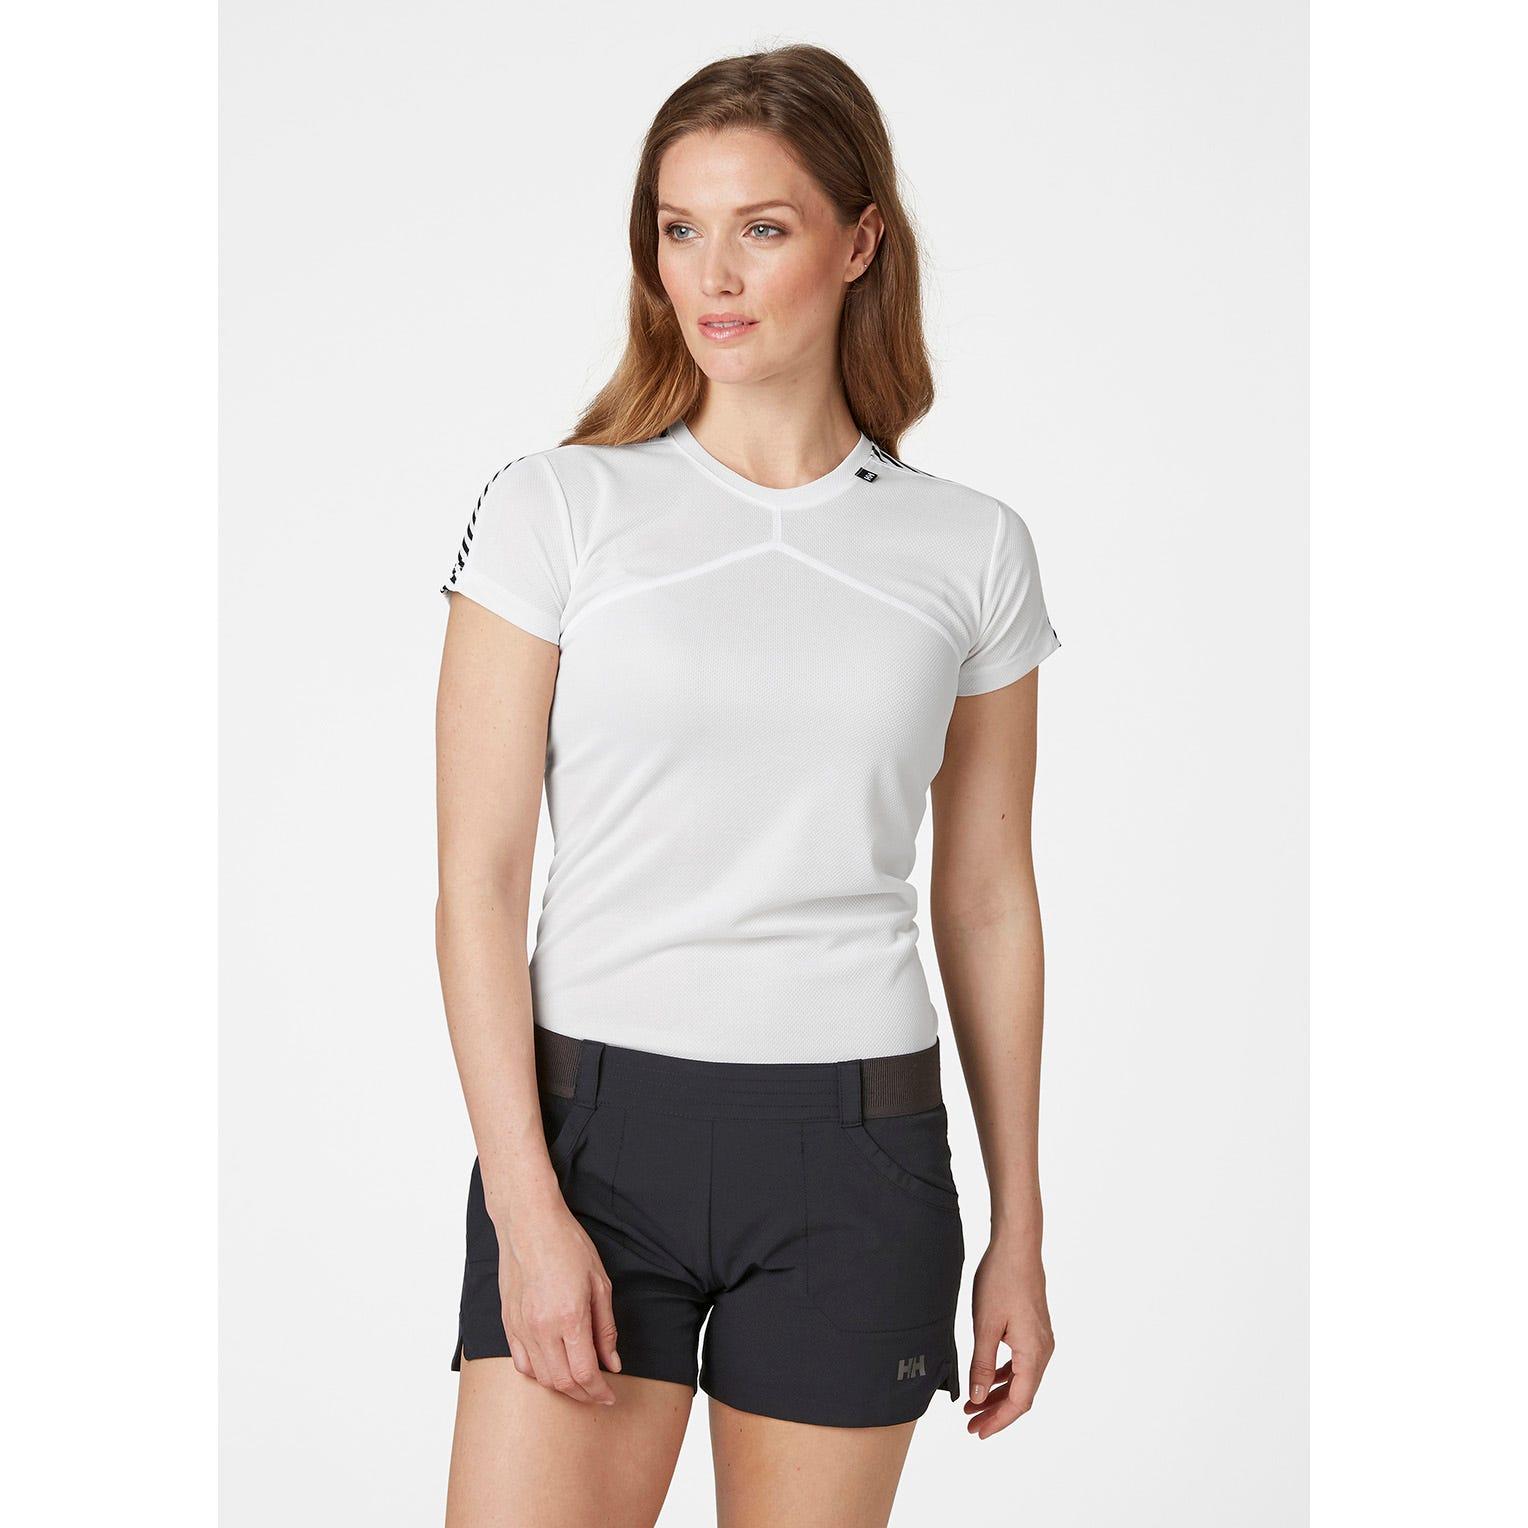 Helly Hansen Womens Lifa Tshirt Baselayer White S